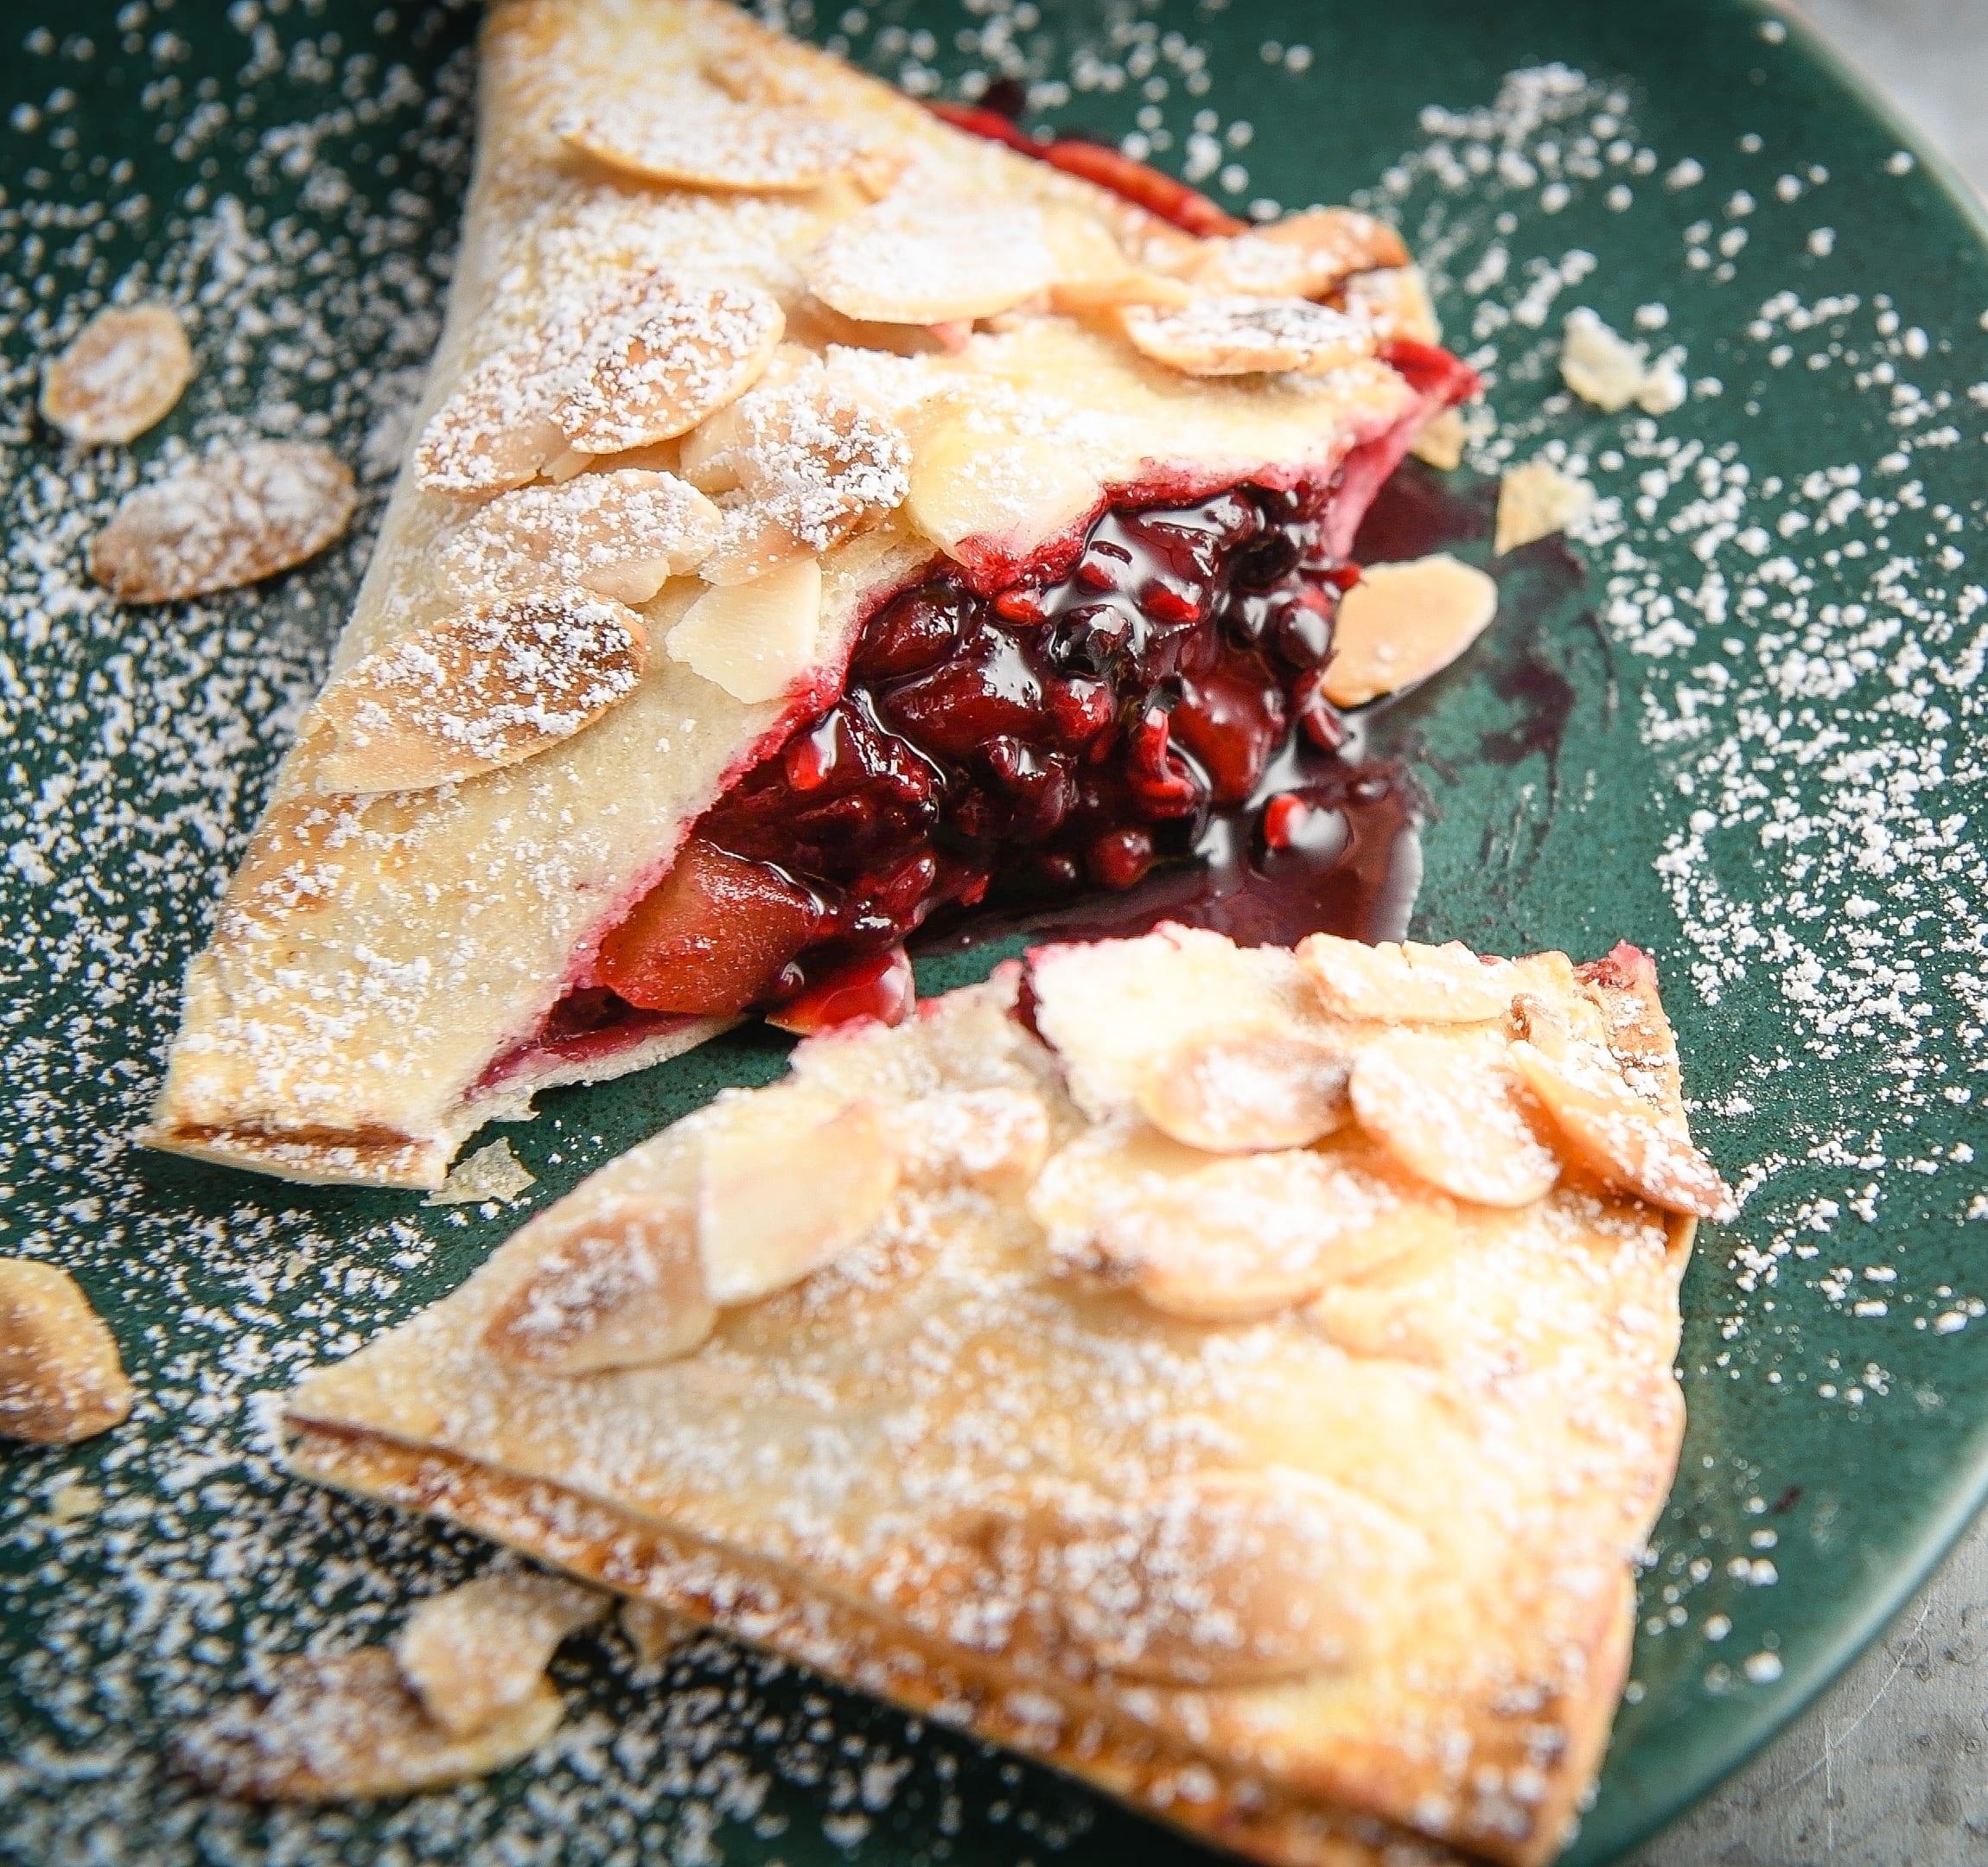 Photo of Apple & blackberry tortilla pies by WW